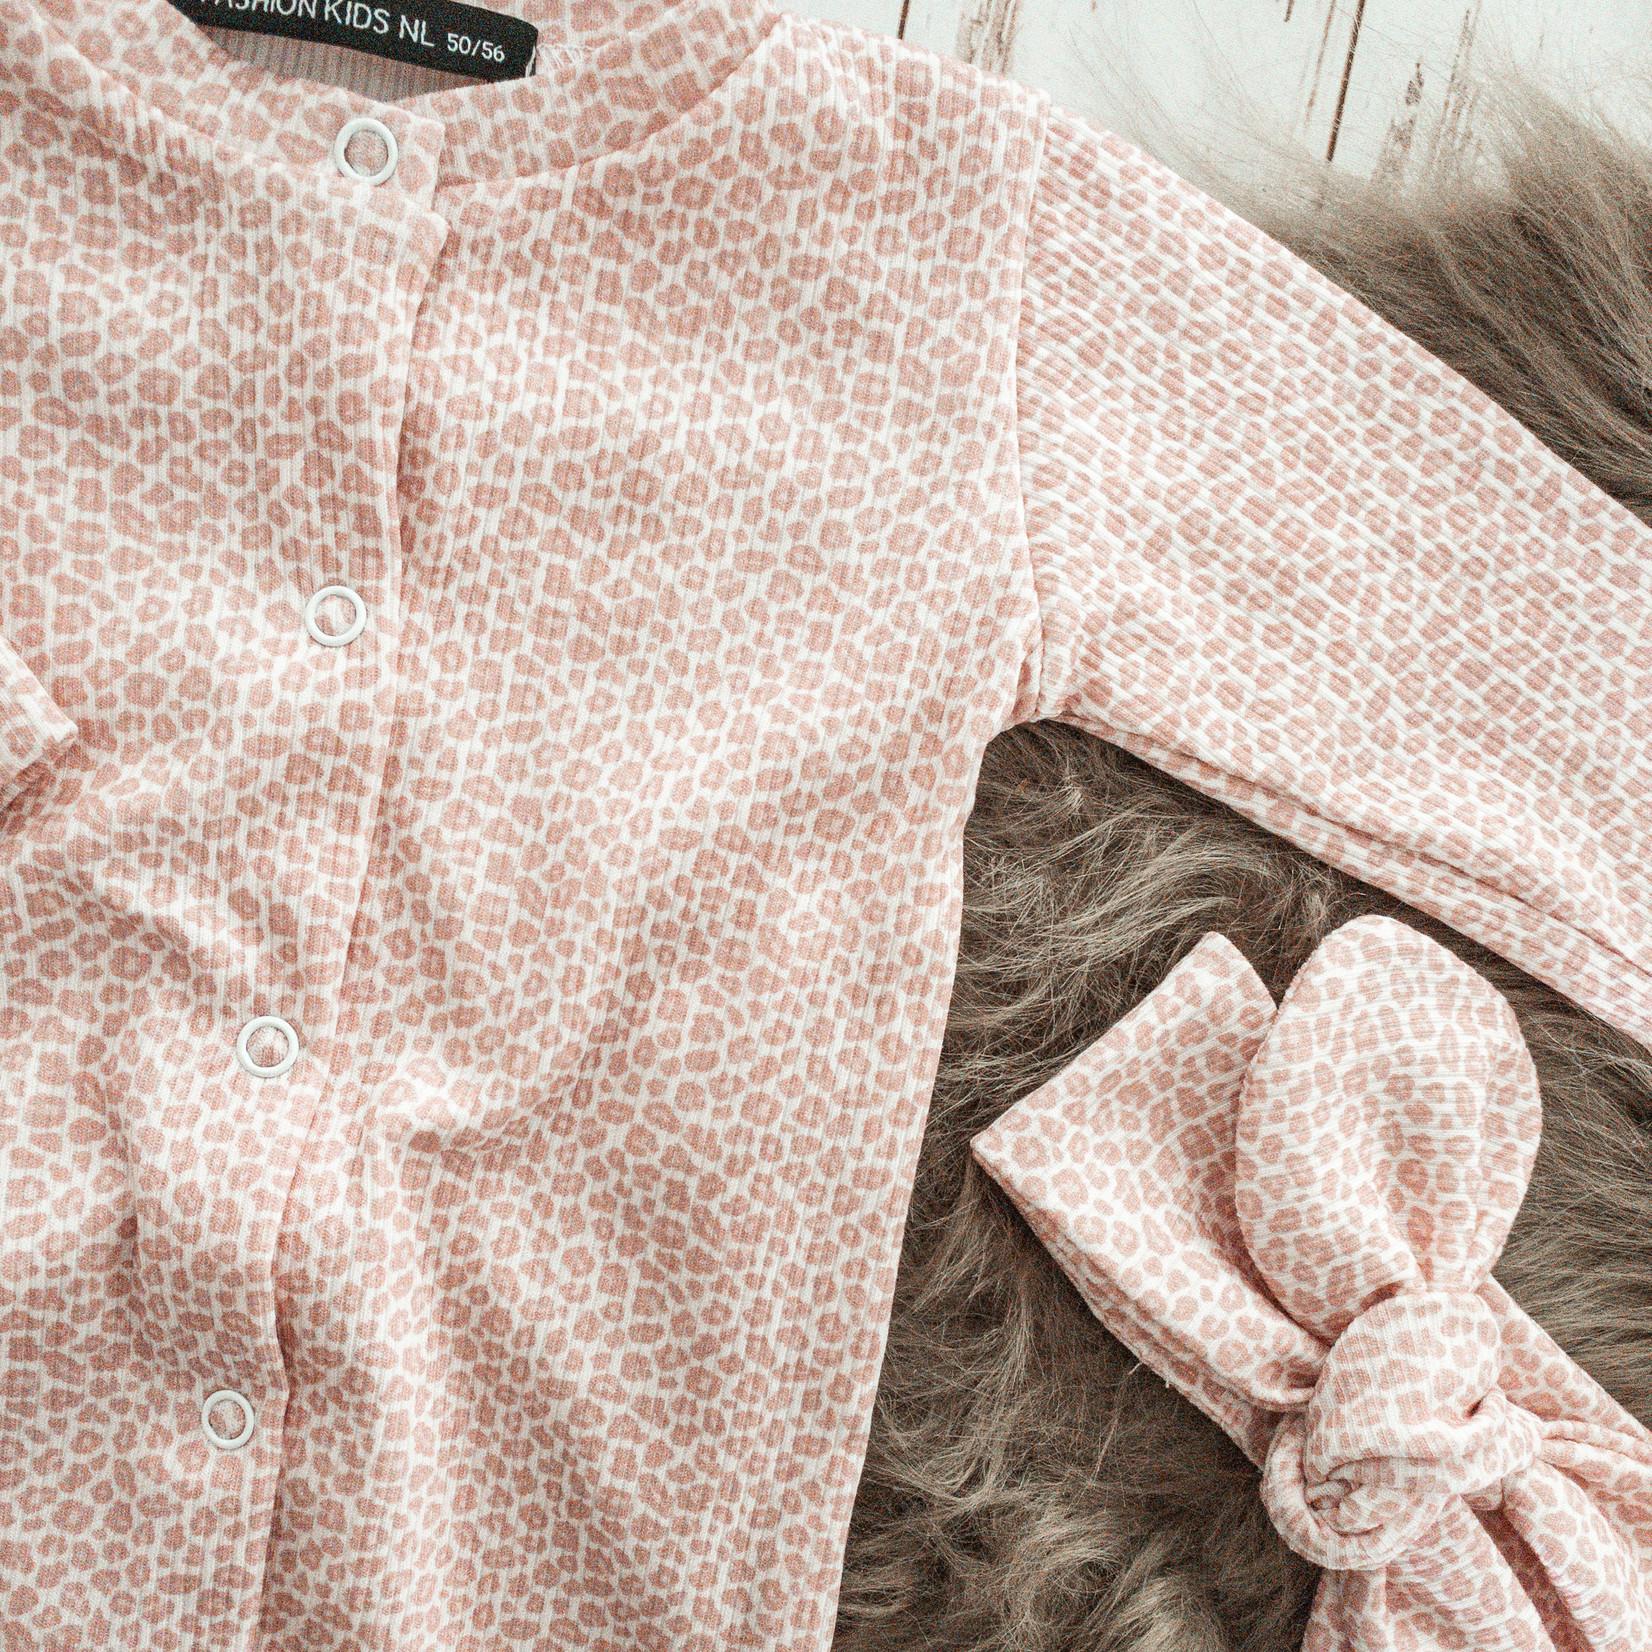 Fashion Kids  Rib boxpakje panterprint roze